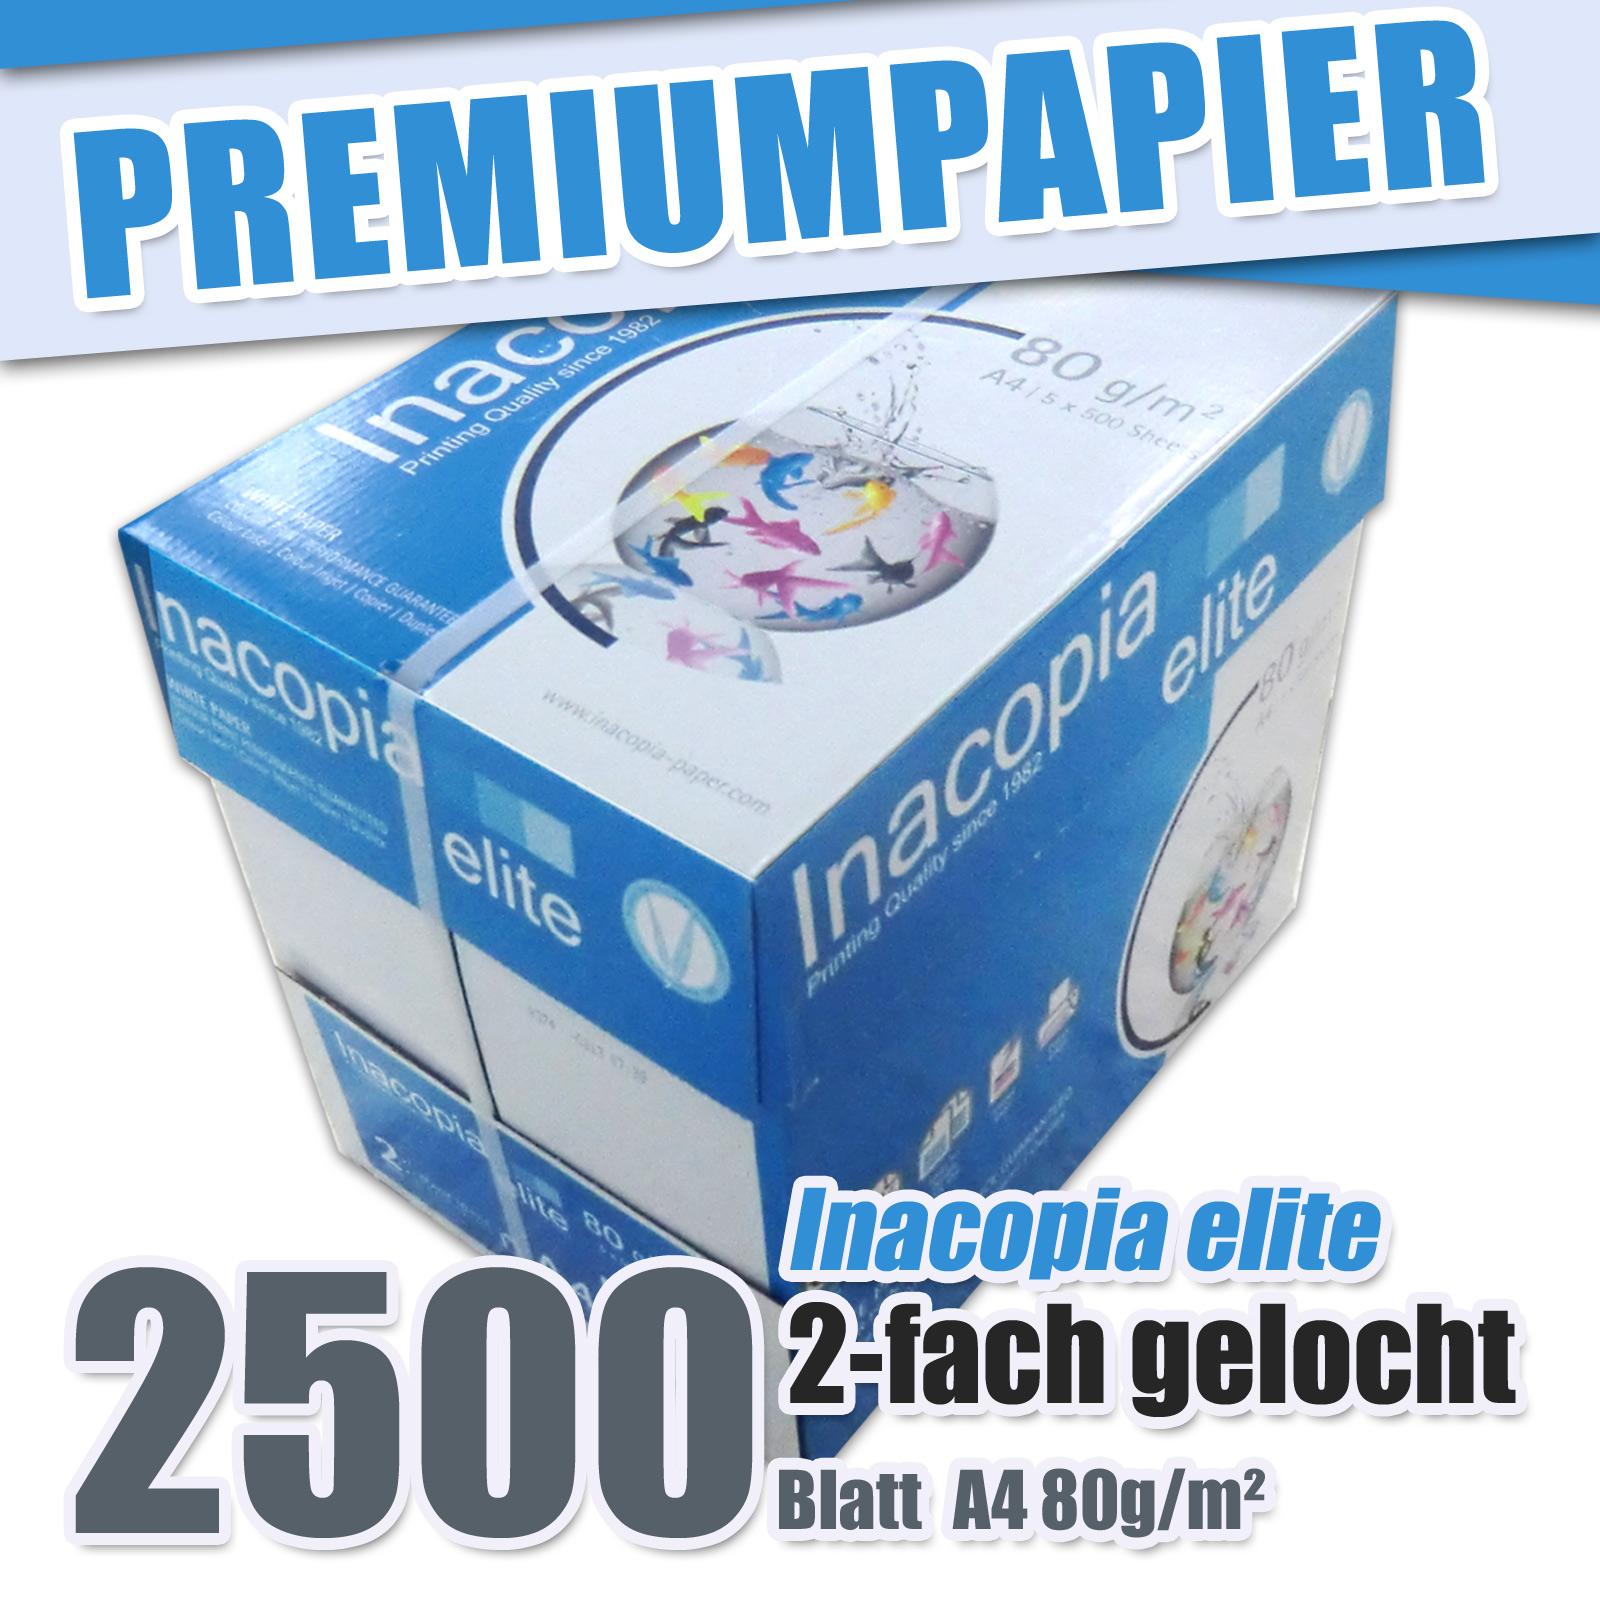 2500 blatt gelocht inacopia elite 80g m a4 kopierpapier premium hp laser papier ebay. Black Bedroom Furniture Sets. Home Design Ideas